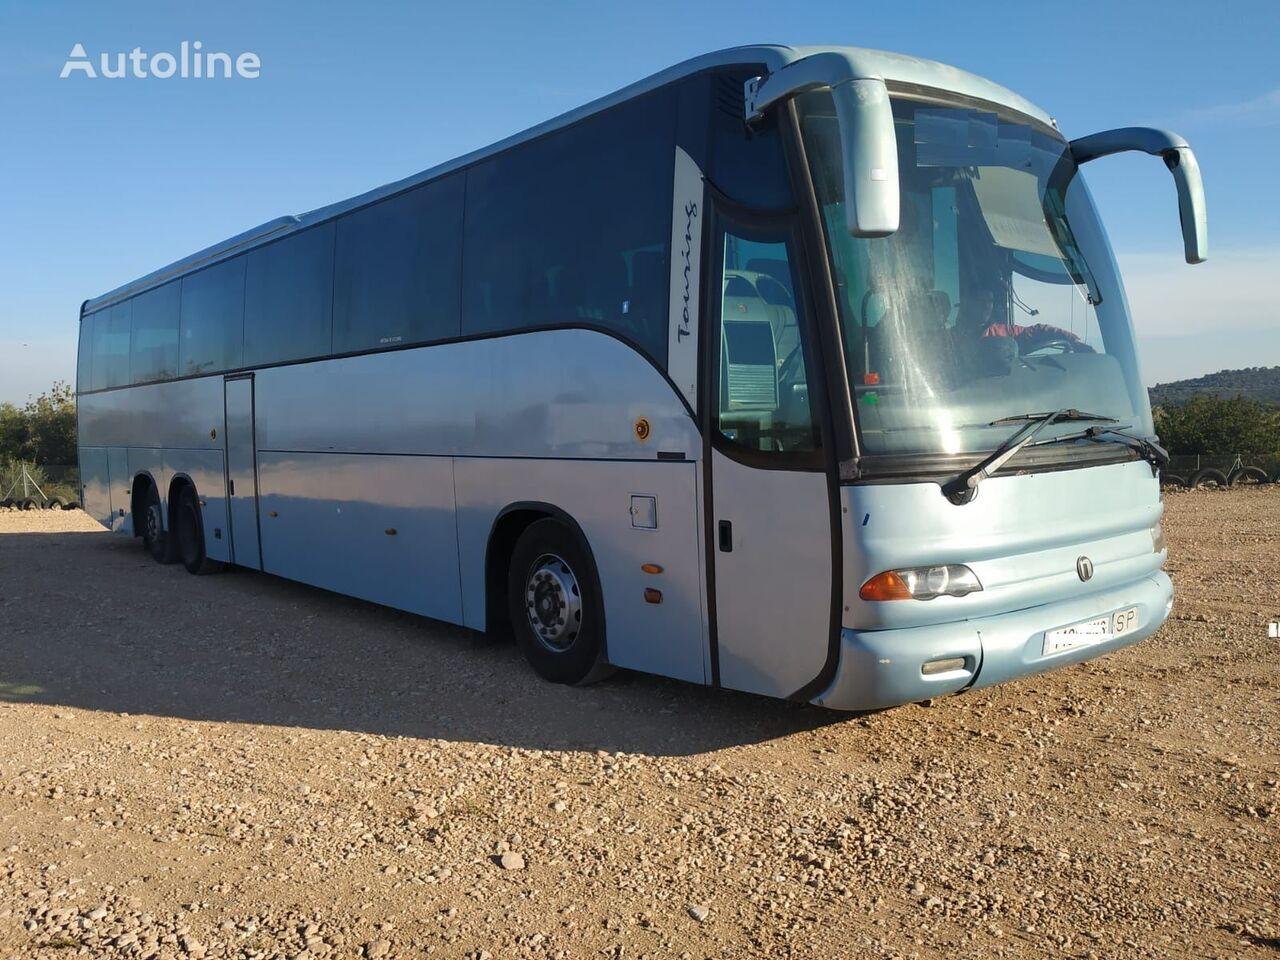 MAN 24460 HOCLN NOGE TOURING 66 PLAZAS 460CV  touringcar